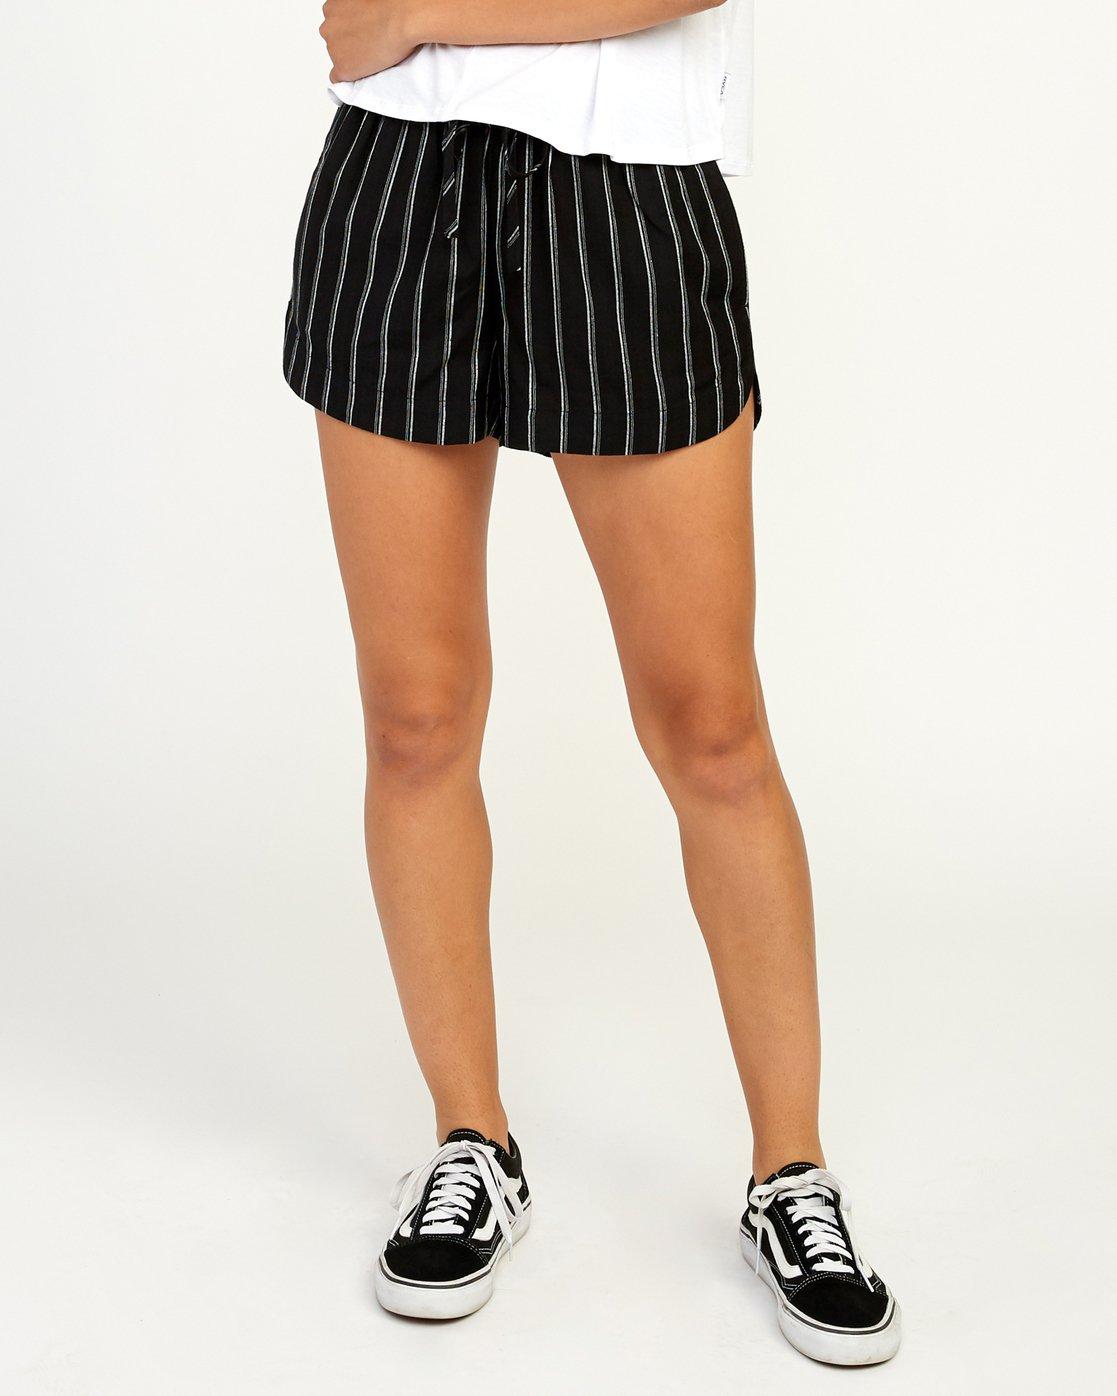 0 New Yume - Short pour Femme Noir N3WKRYRVP9 RVCA